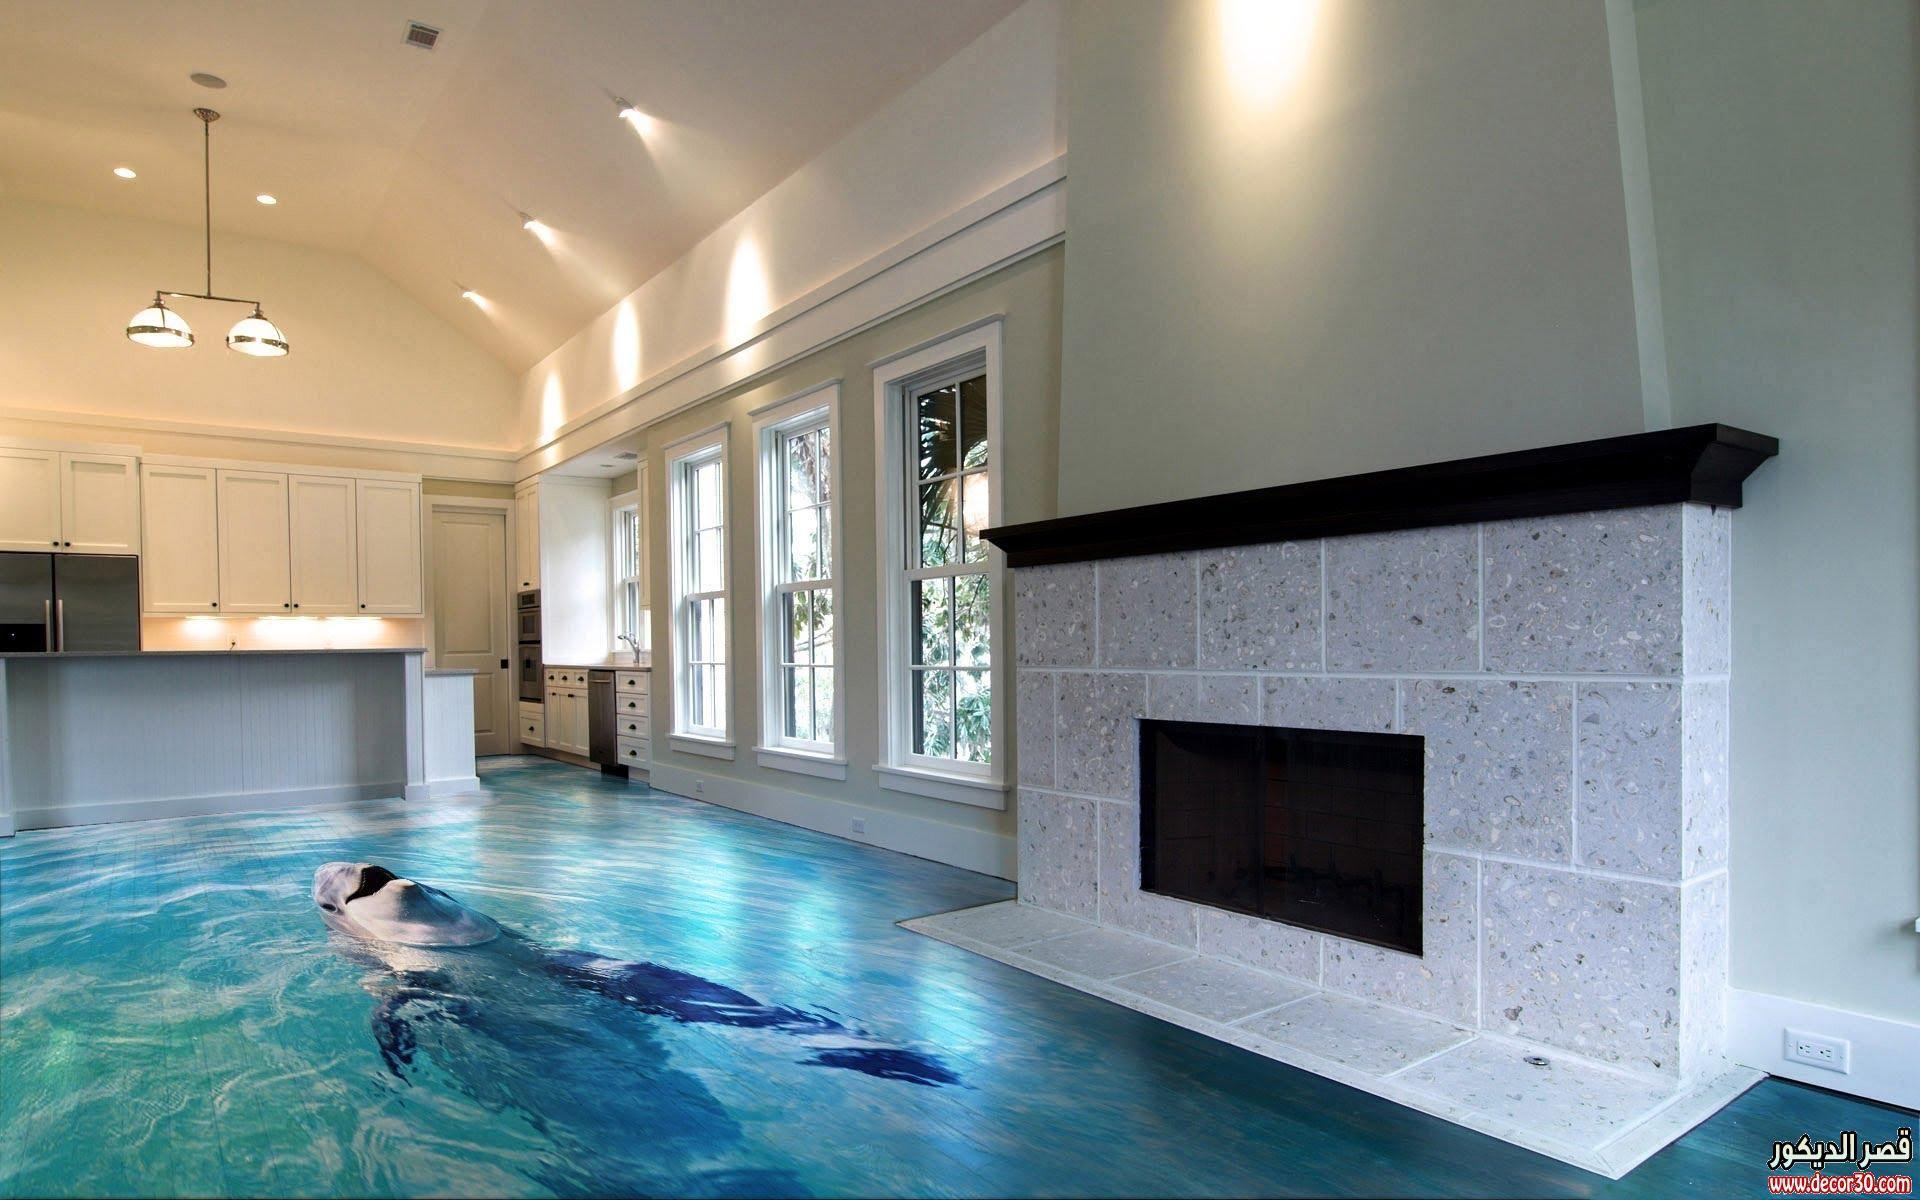 ارضيات ثرى دى تحاكى الواقع The Most Dangerous Sree De Flooring Floor Design House Painting Cost 3d Flooring